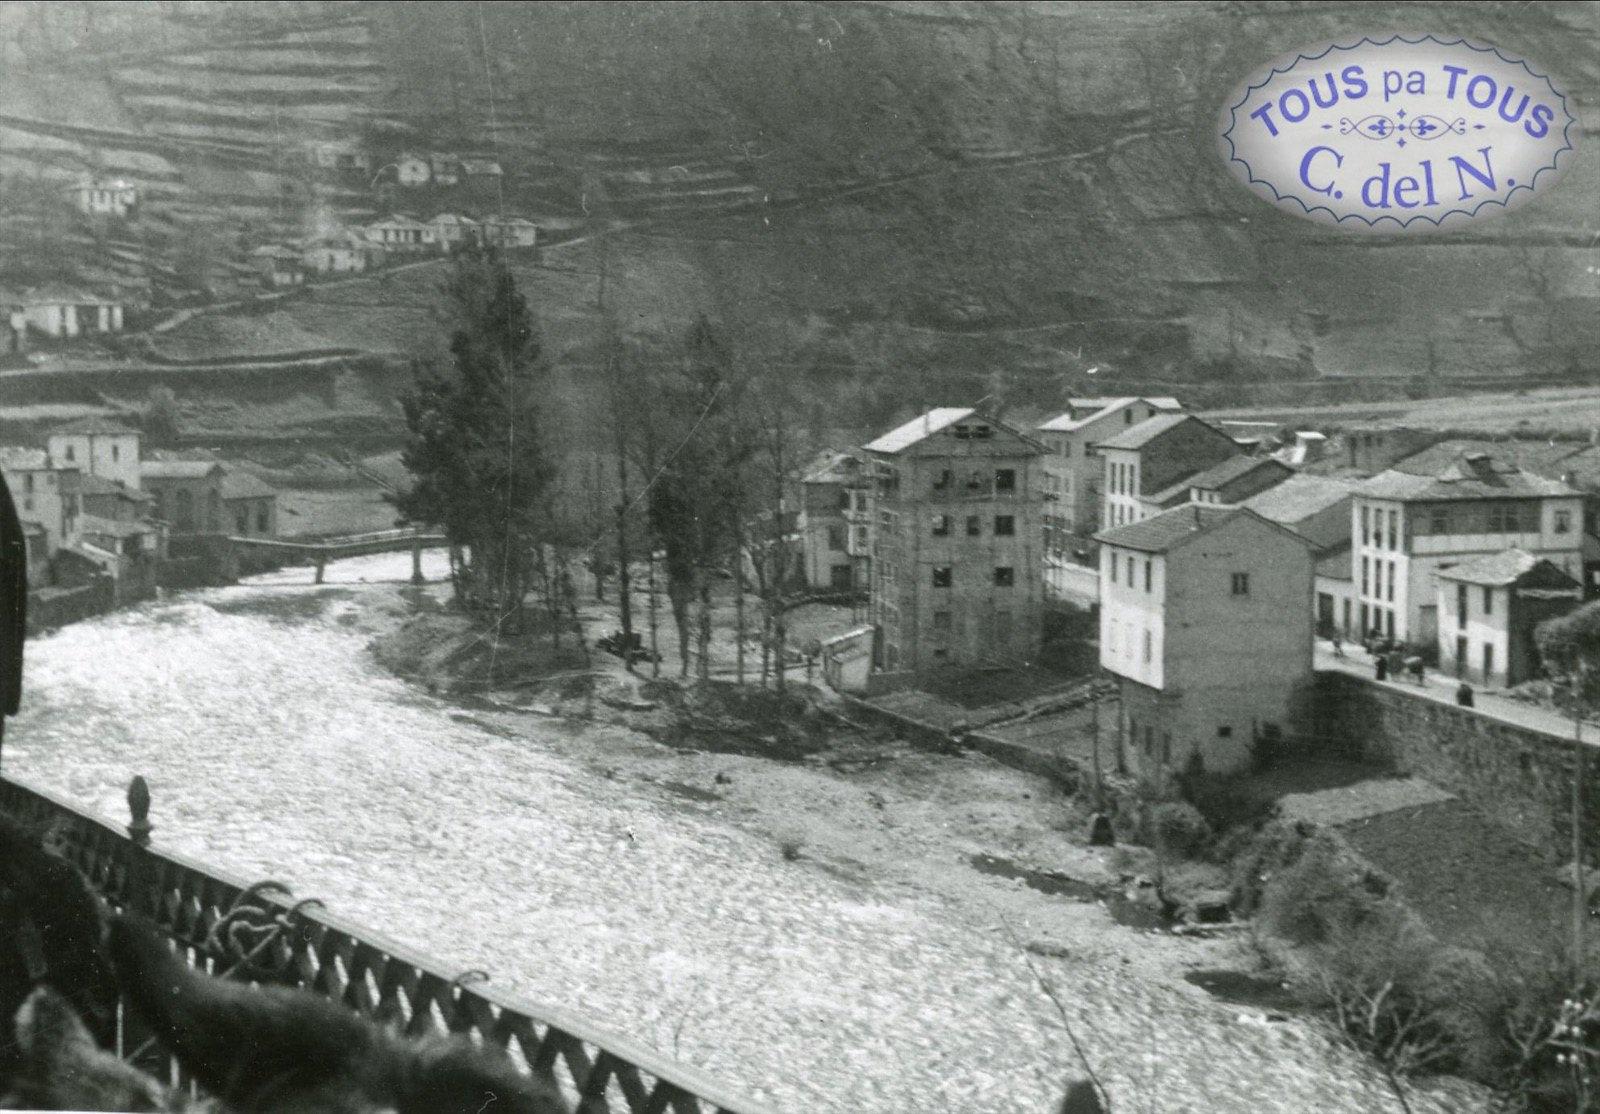 1958 - Río Narcea